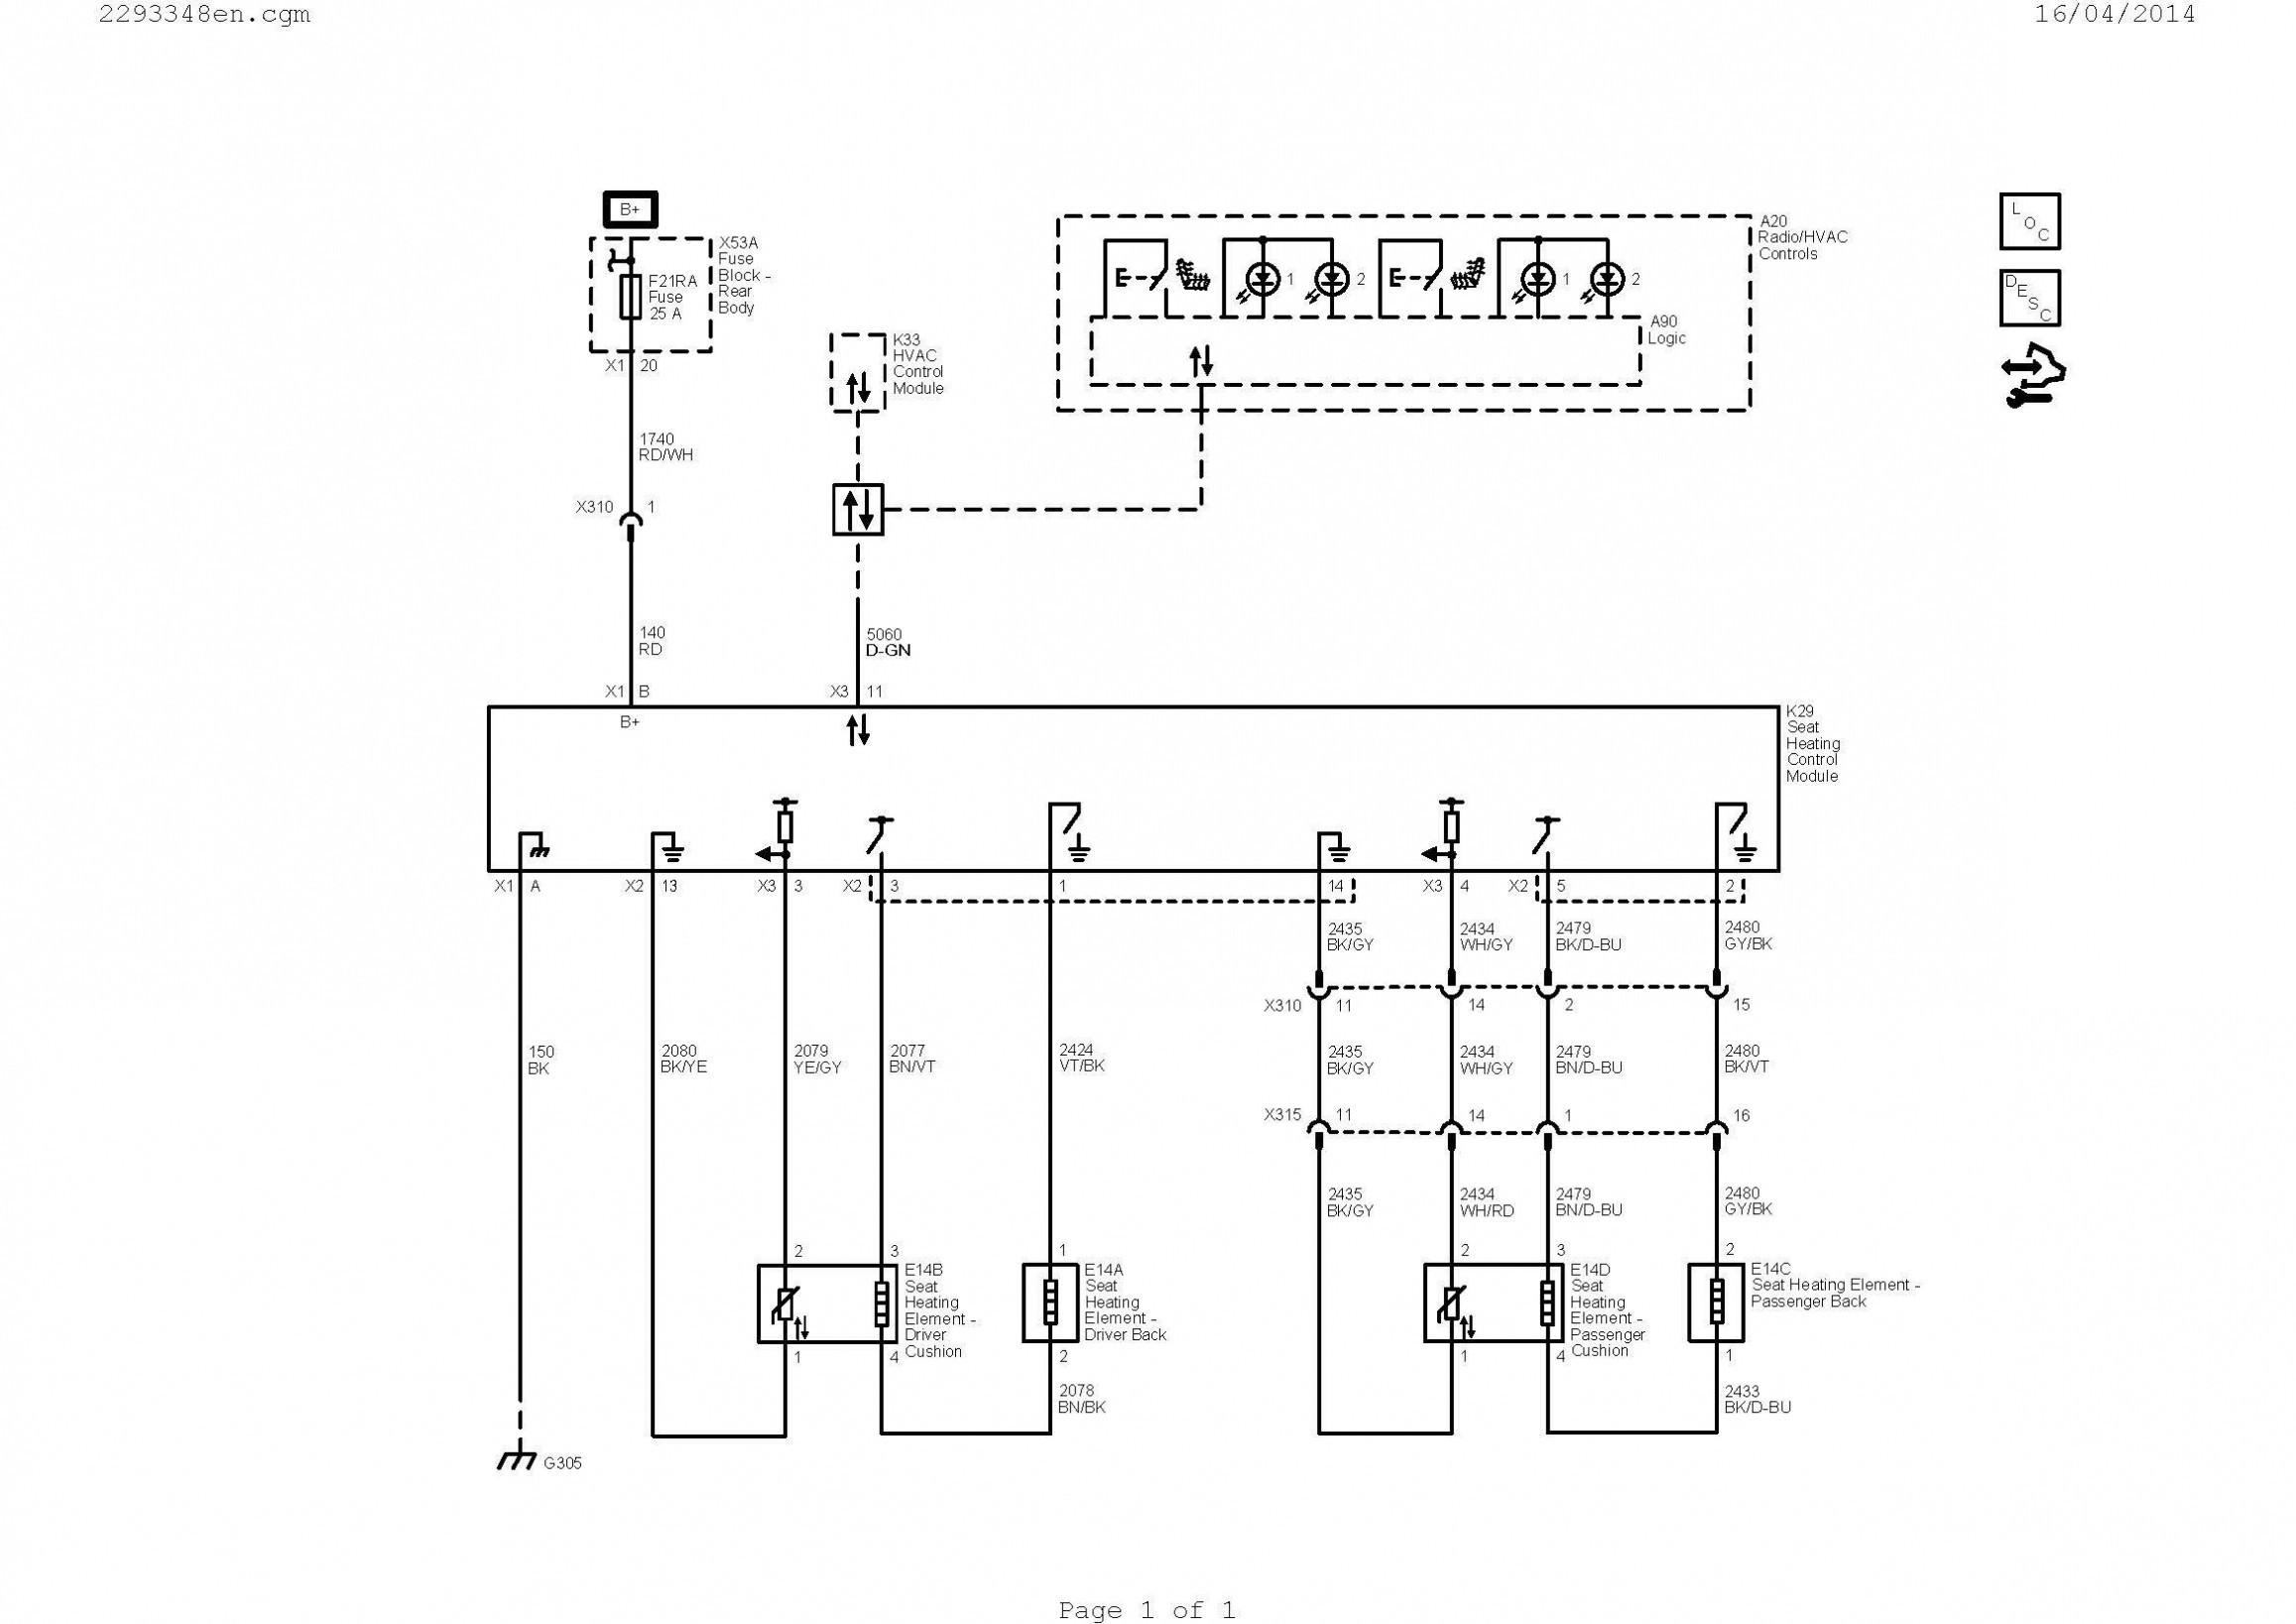 Rear Brake Diagram Chevy Ignition System Wiring Diagram Save top Car Brake Diagram Rear Of Rear Brake Diagram